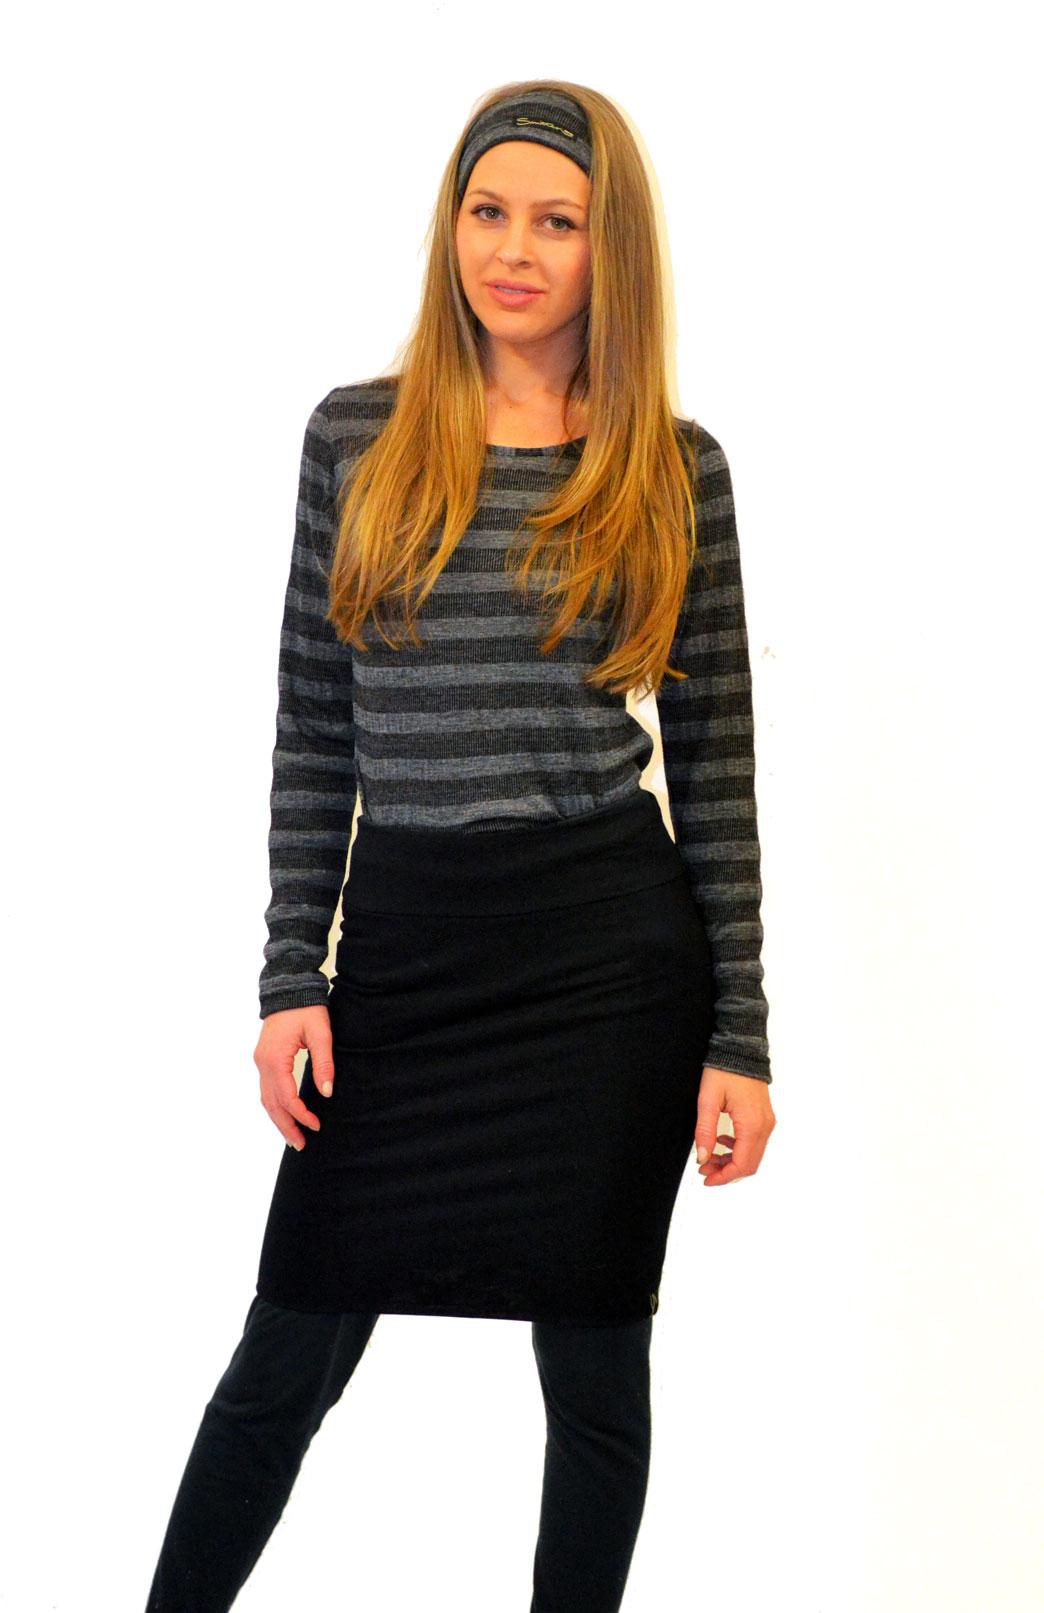 Round Neck Top - Patterned - Women's Black and Grey Wide Stripe Long Sleeved Merino Wool Thermal Fashion Top - Smitten Merino Tasmania Australia